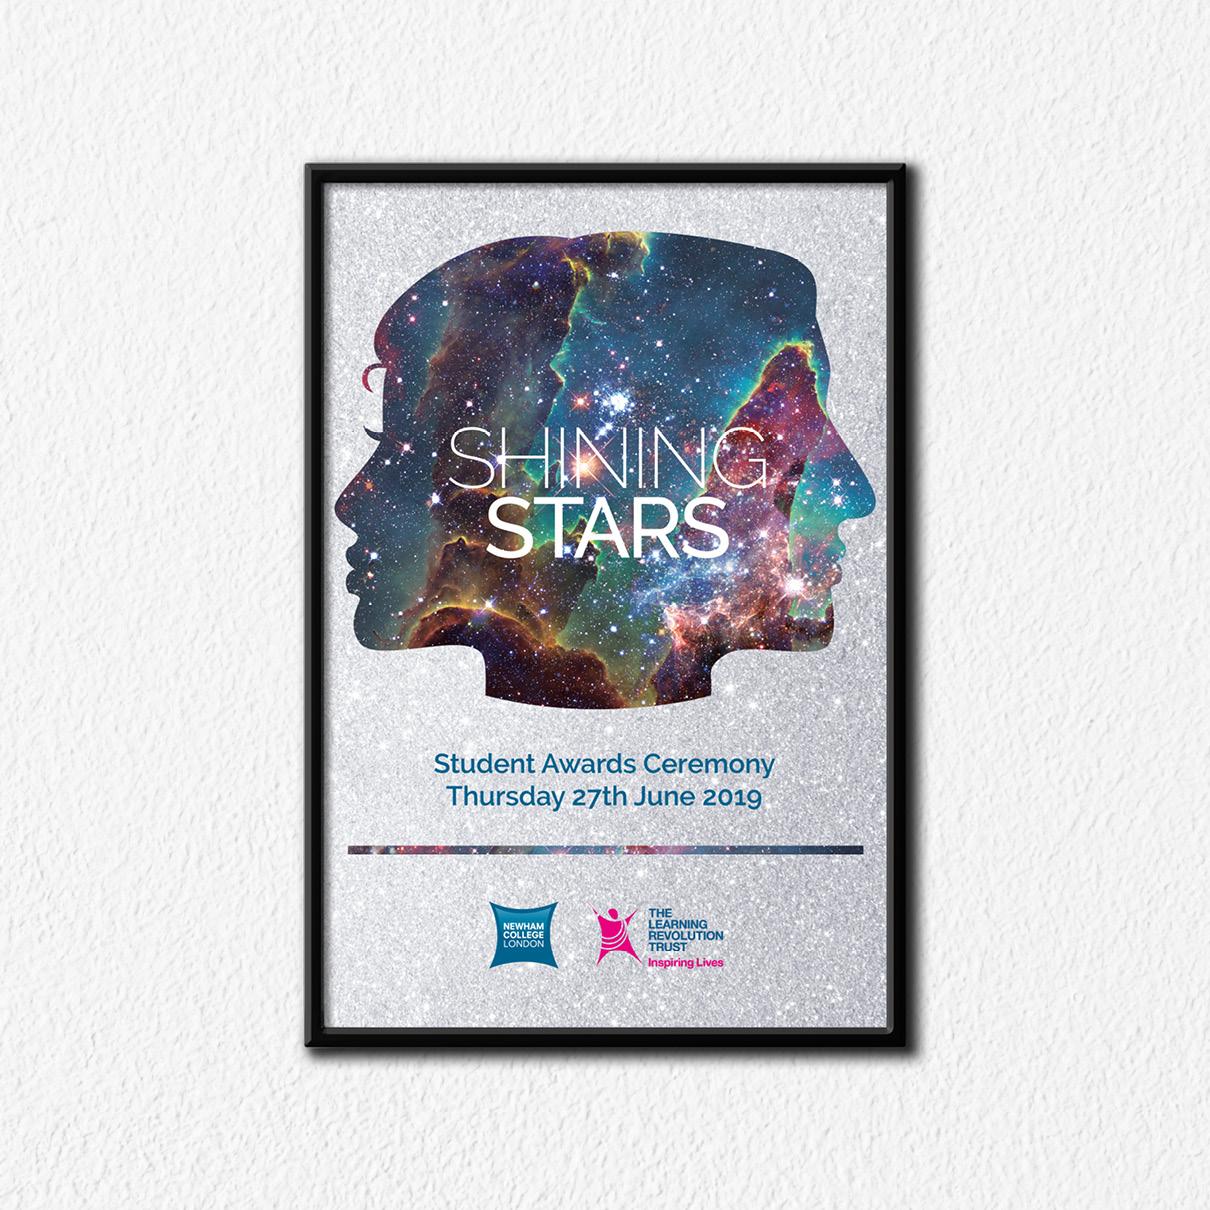 Shinning-Stars2